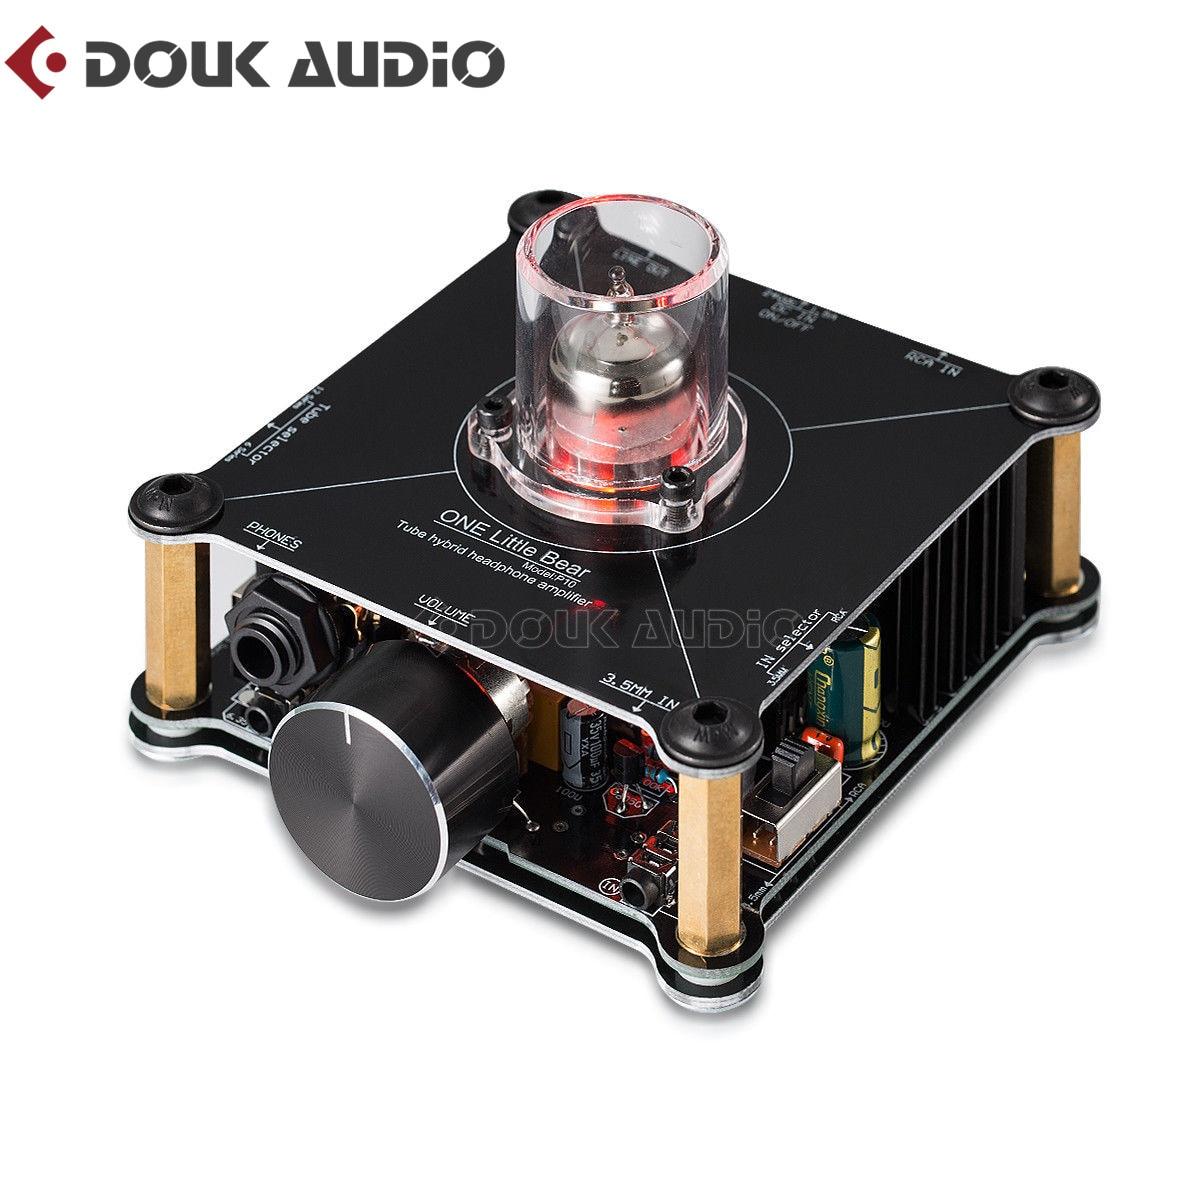 Douk audio Hi Fi Mini Class A 12AU7 Tube Multi Hybrid Headphone Amplifier Stereo Pre Amp